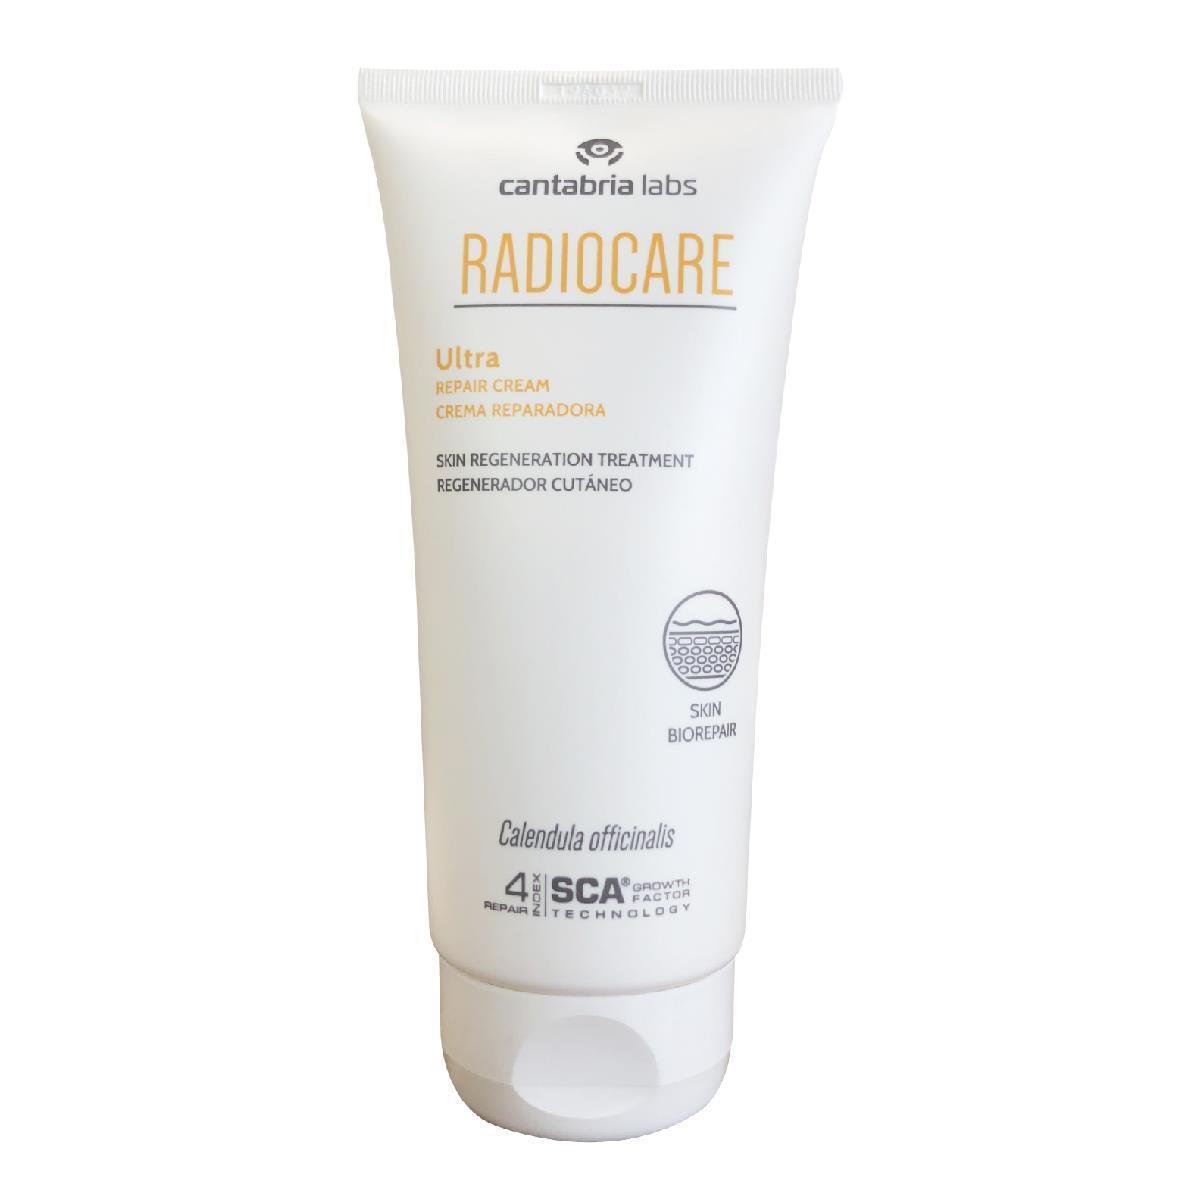 Radiocare Ultra 150Ml